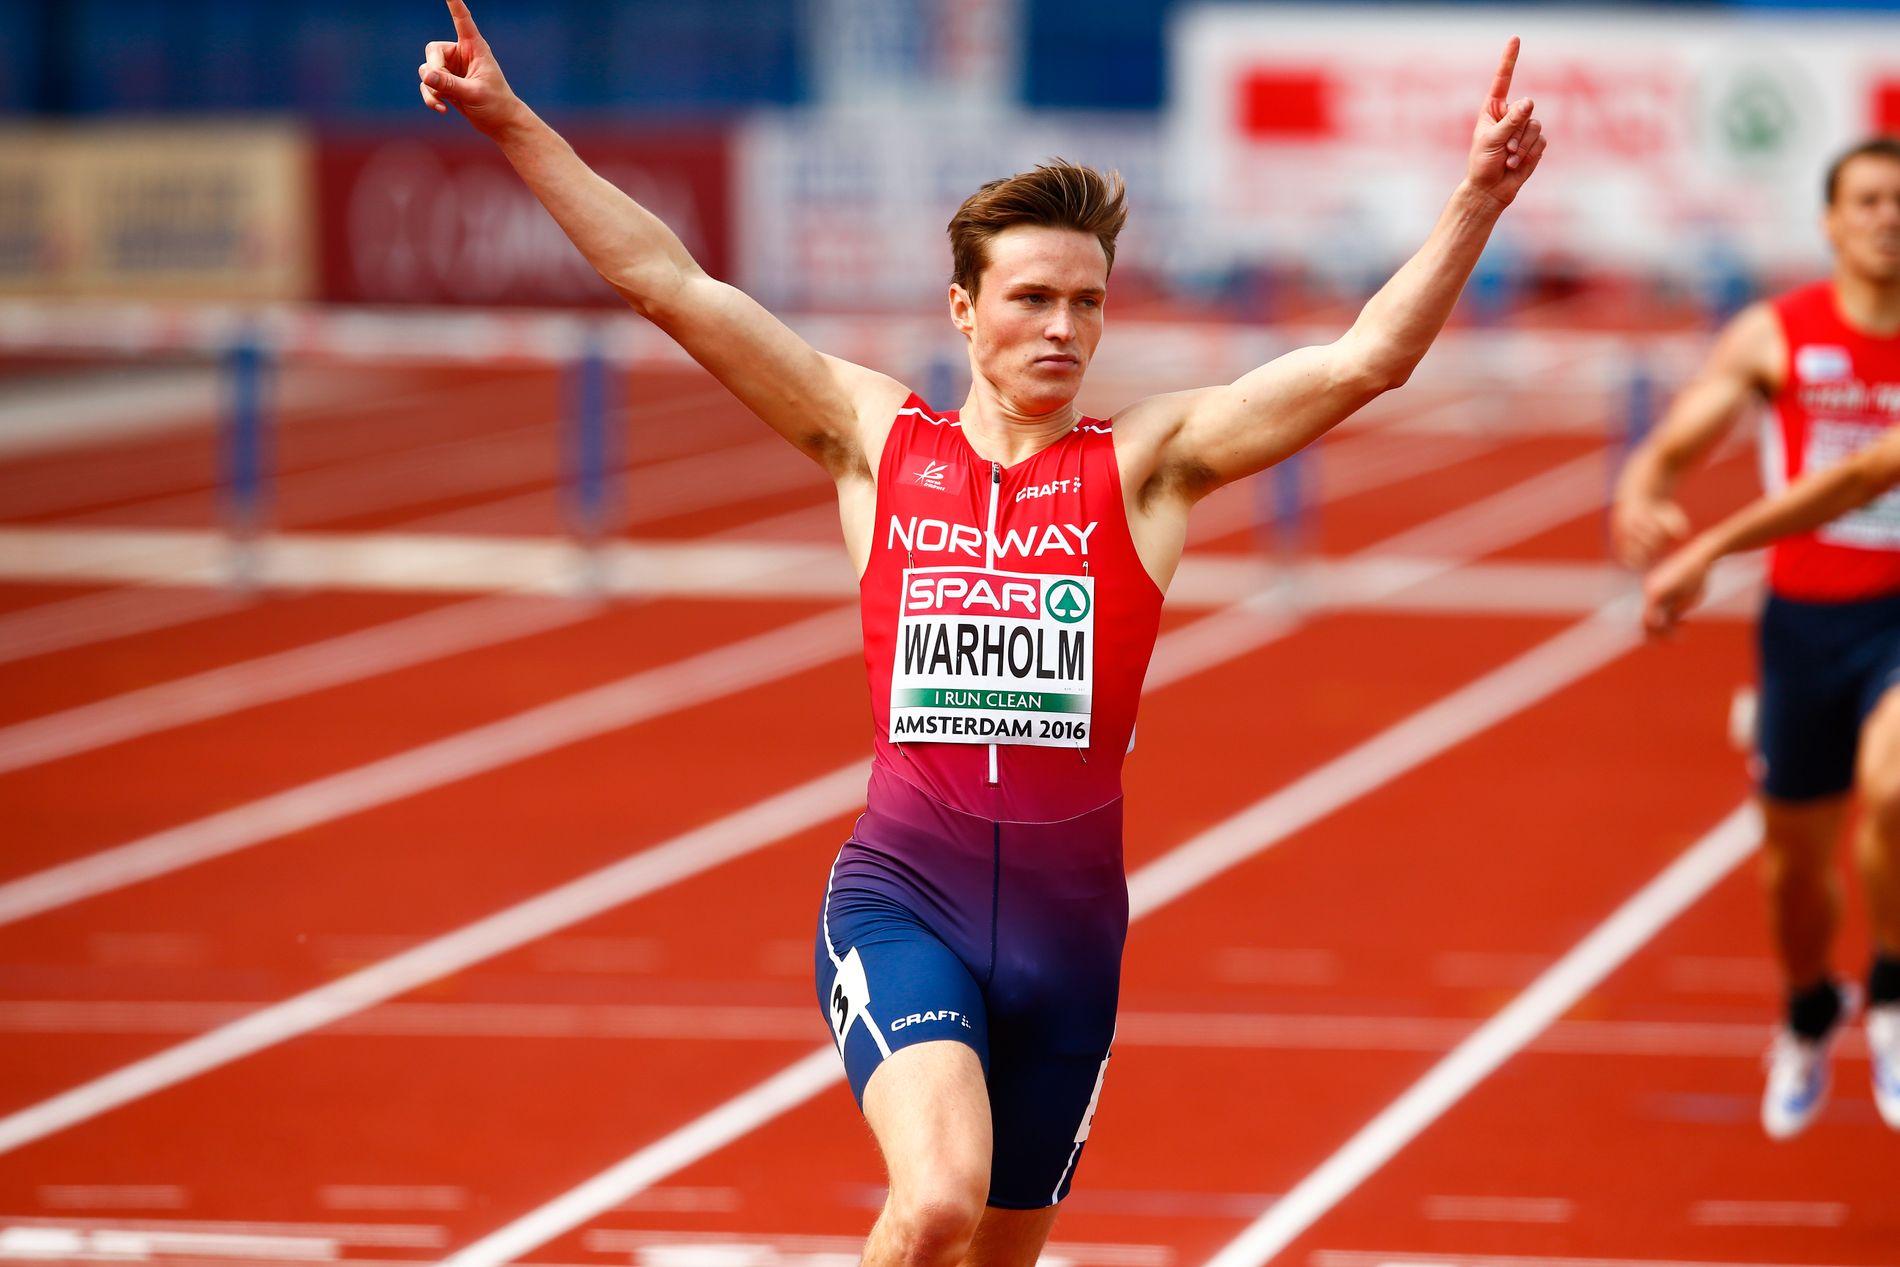 NY REKORD: Karsten Warholm jubler etter at han satte ny norsk rekord og vant semifinalen i 400 meter hekk under EM i friidrett i Amsterdam torsdag.